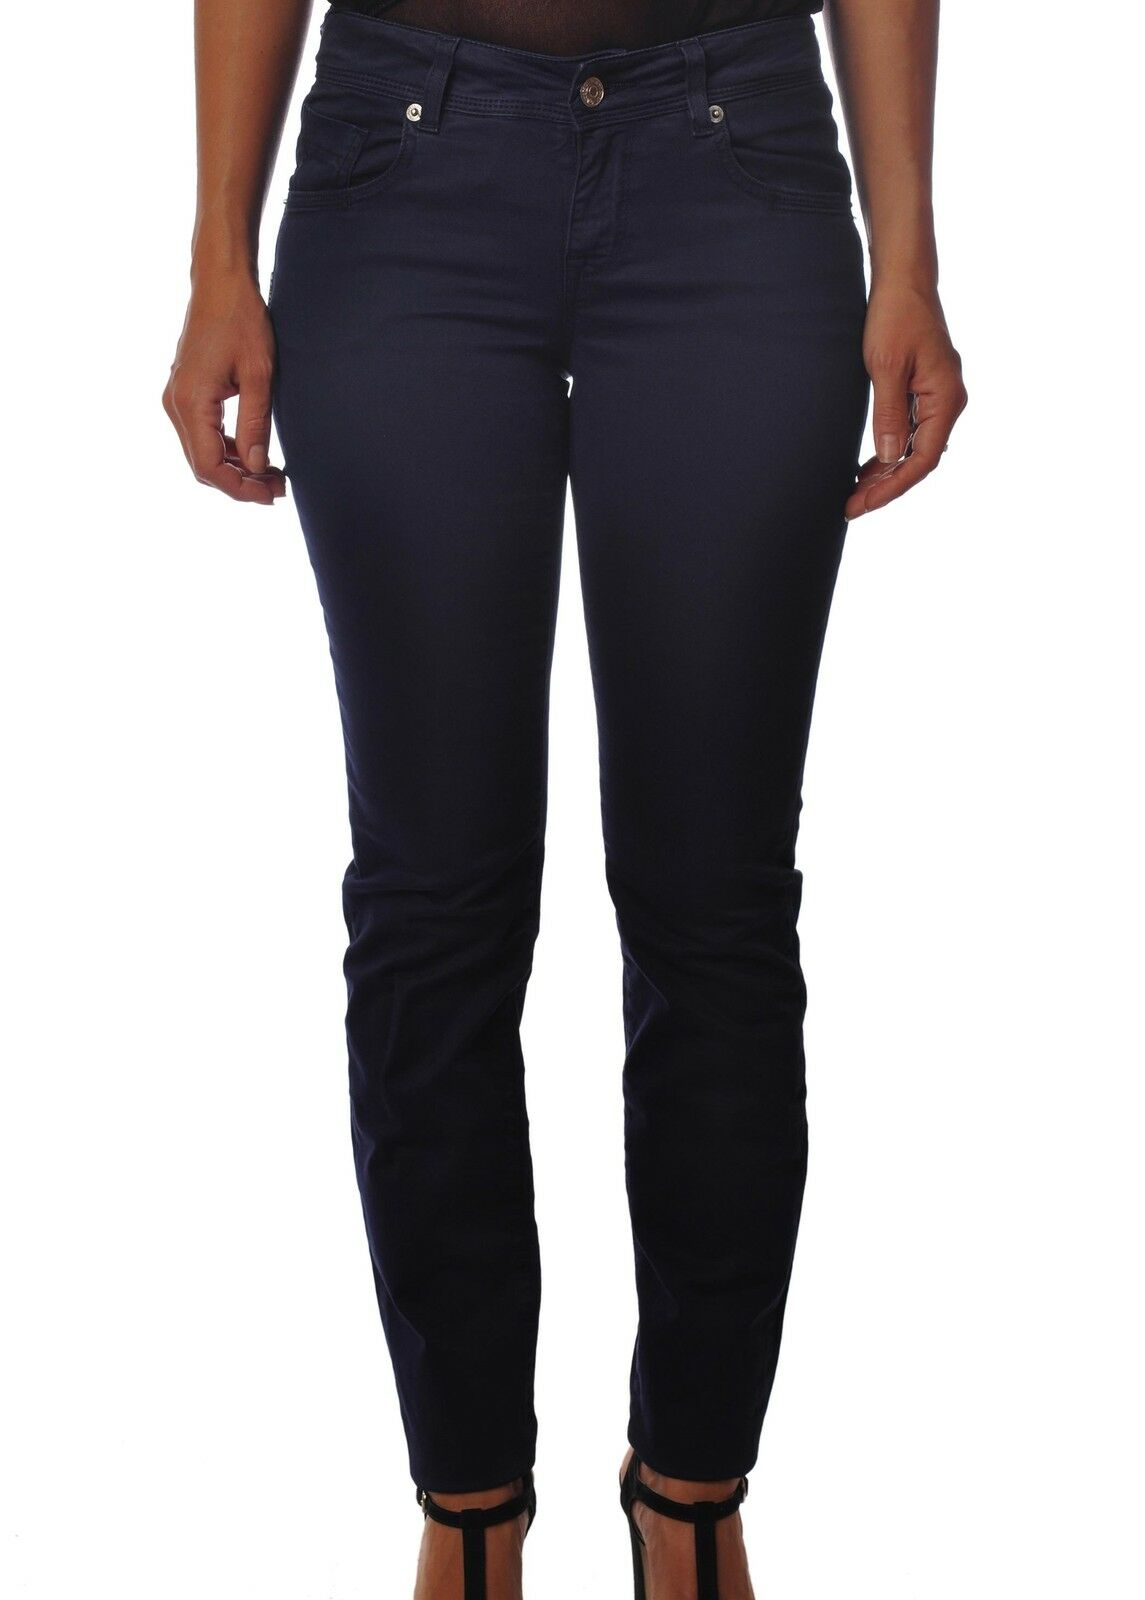 Latinò  -  Pants - Female - bluee - 3821829A181652